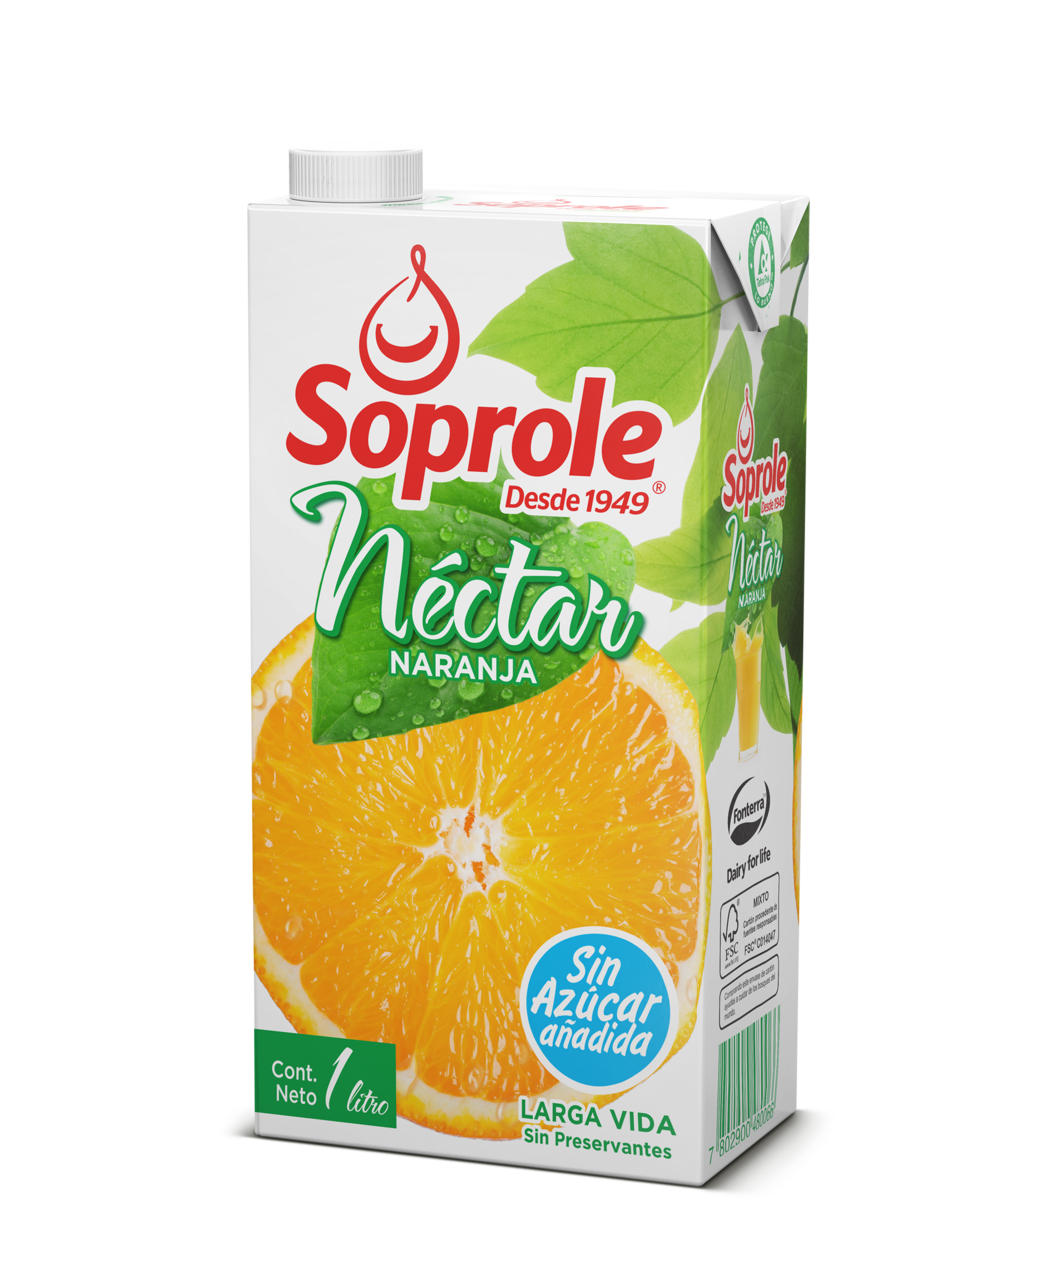 Soprole Néctar Naranja 1L